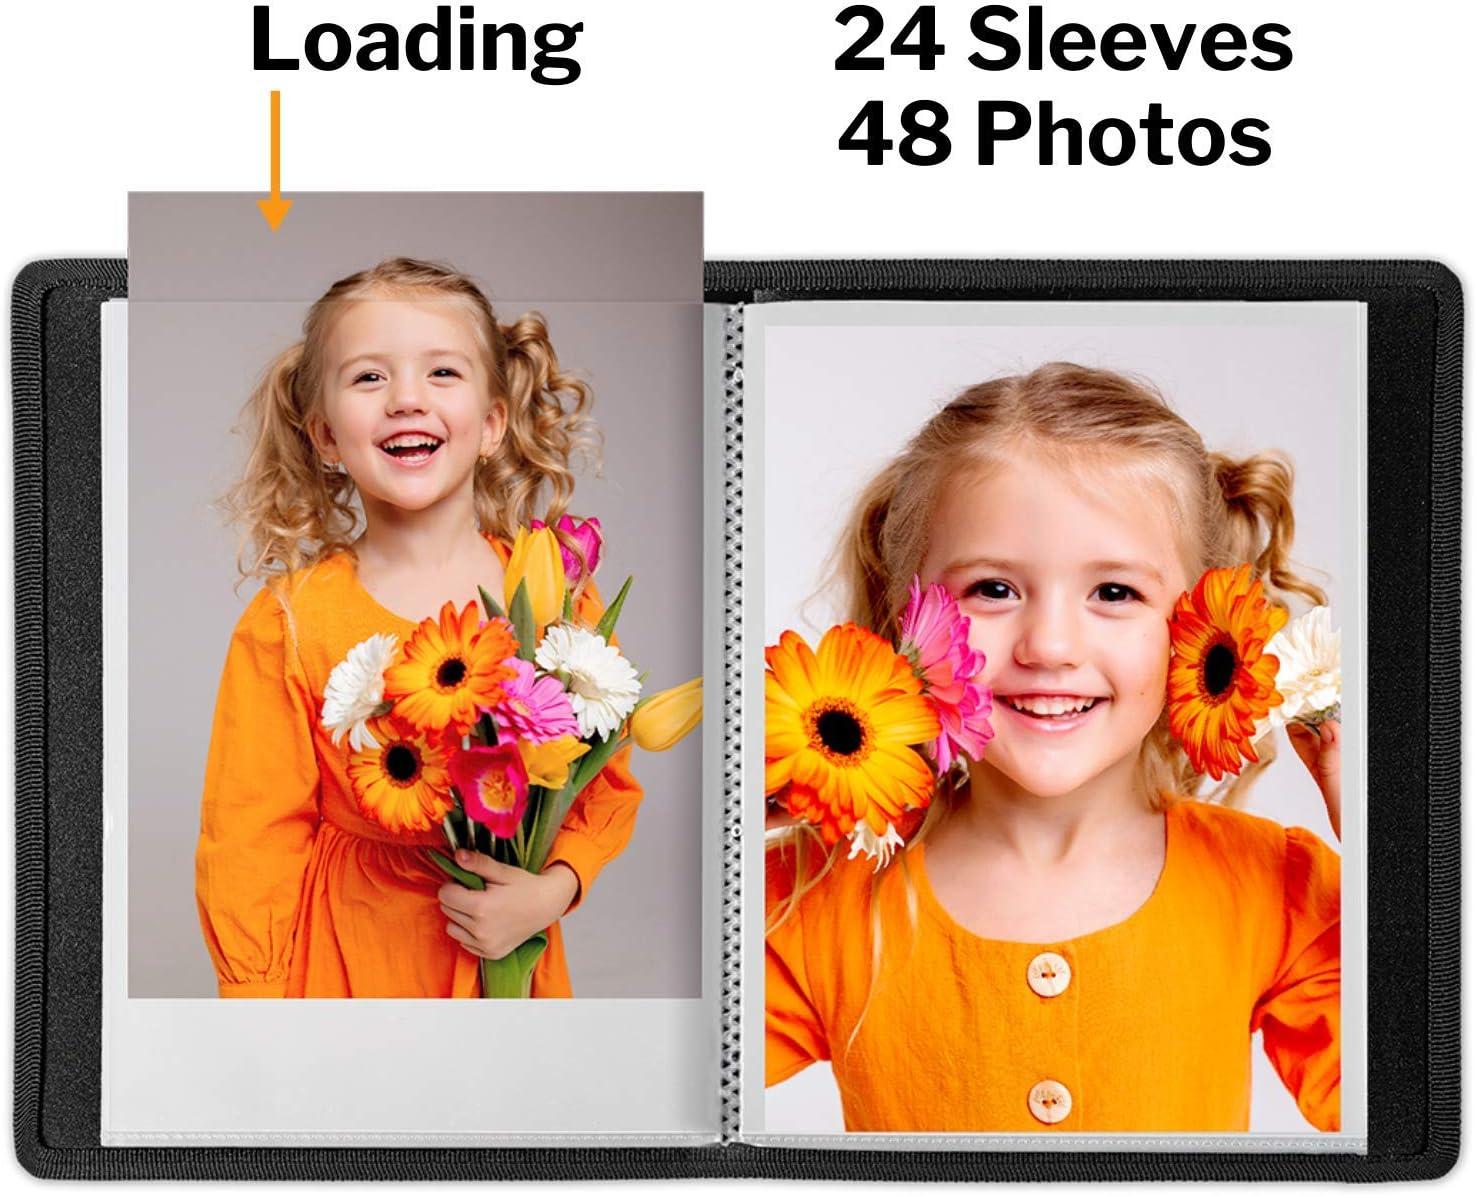 Dunwell 5x7 Portfolio Folder for Artwork - Black, 2 Pack Art Folio Sketches Drawings 24 Pockets Display 48 Photos Scrapbook 5x7 Photo Album Small Photo Album 5x7 Great for Picture Storage